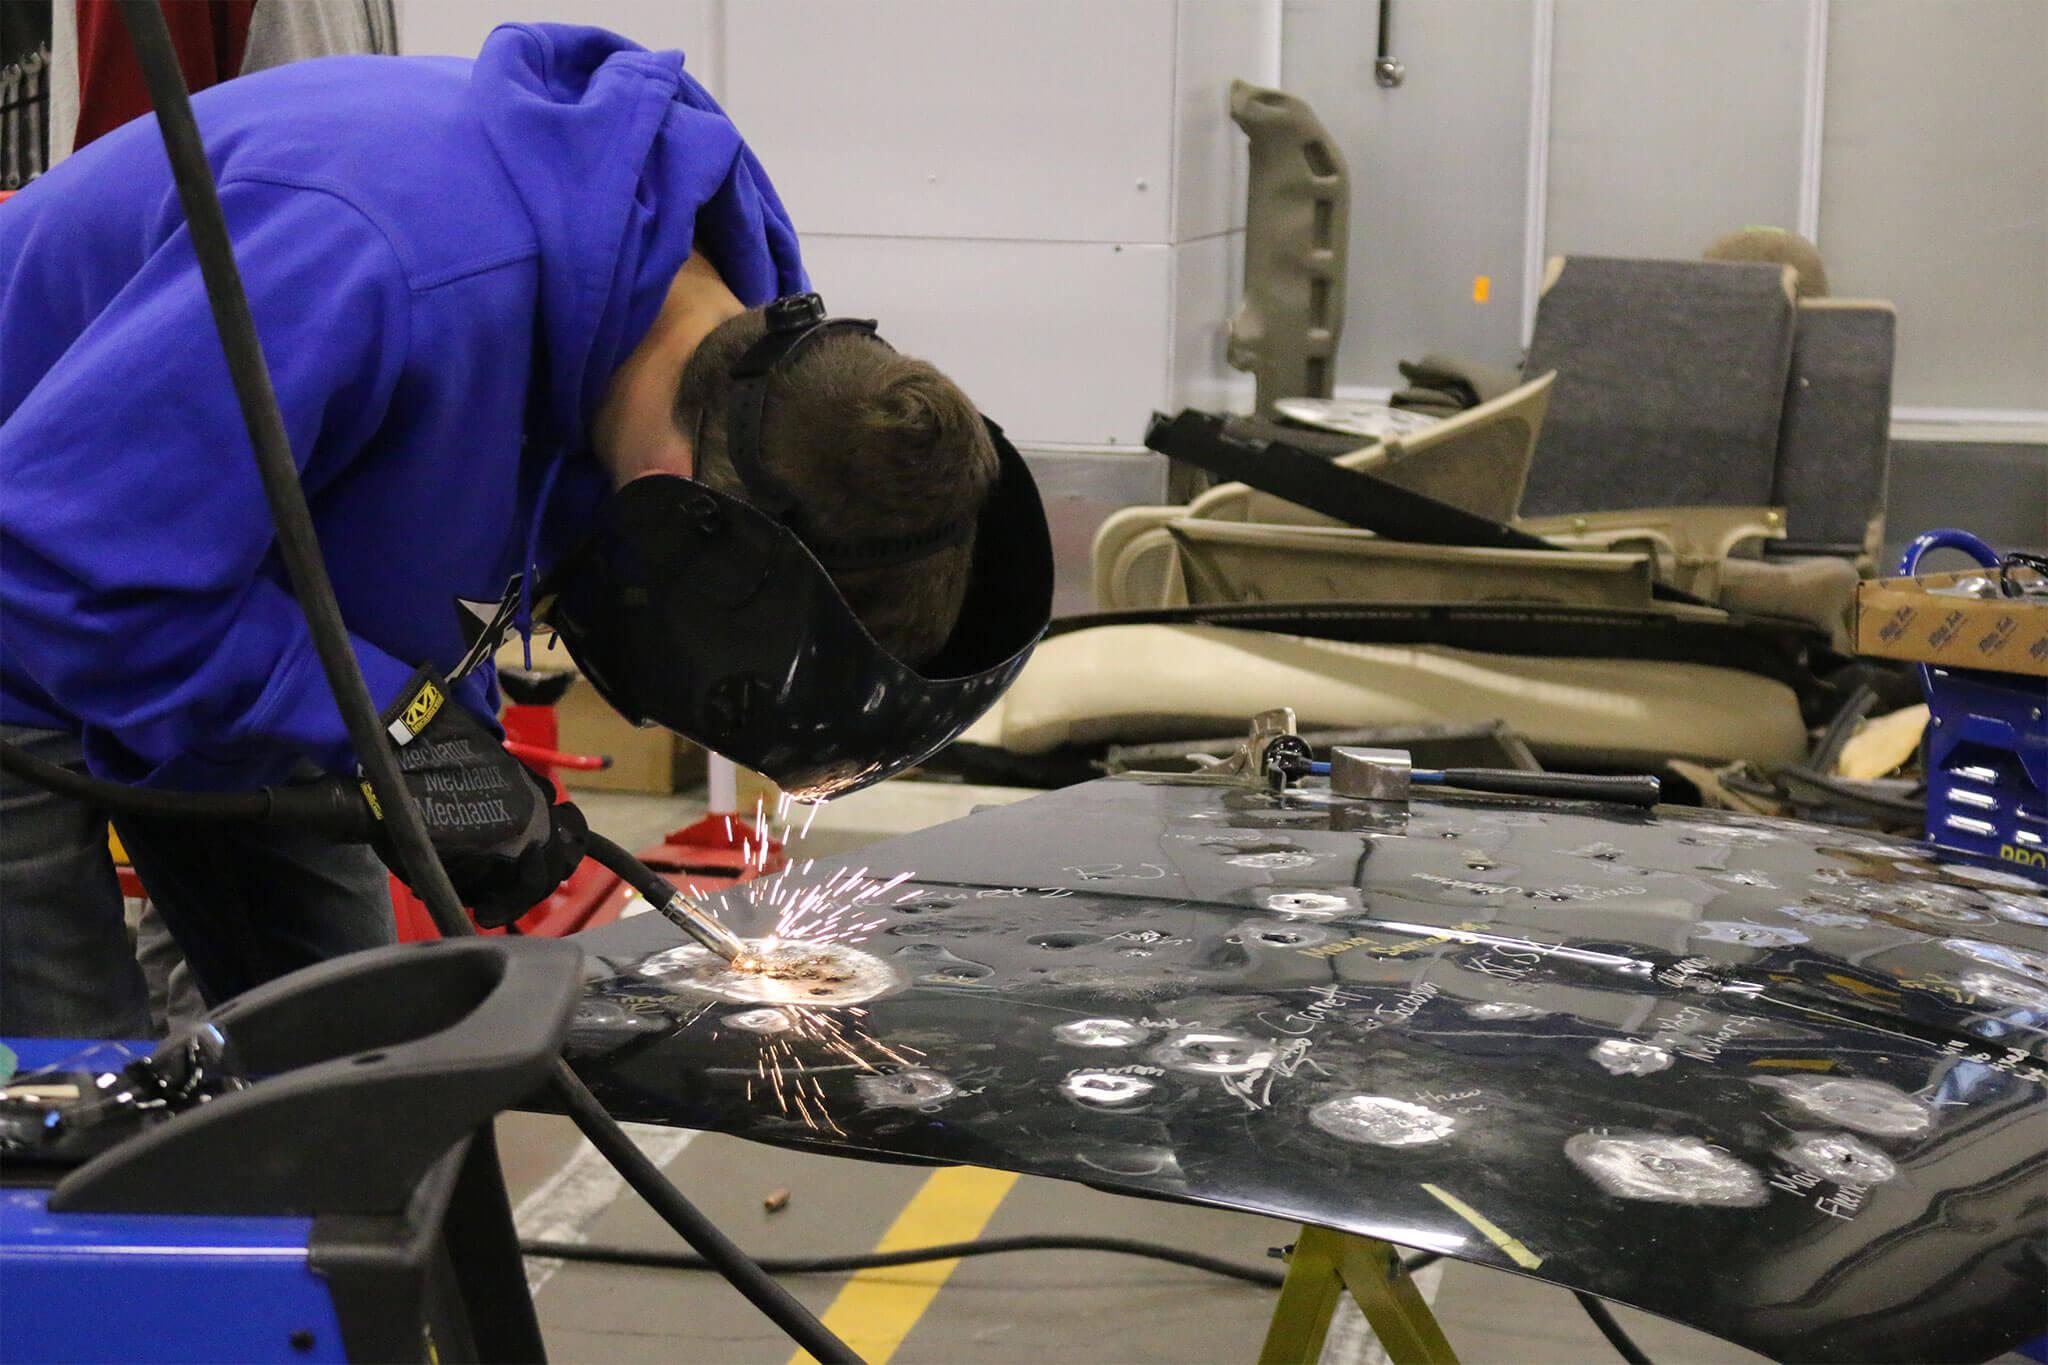 Auto Body Repair and Painting - CTEC